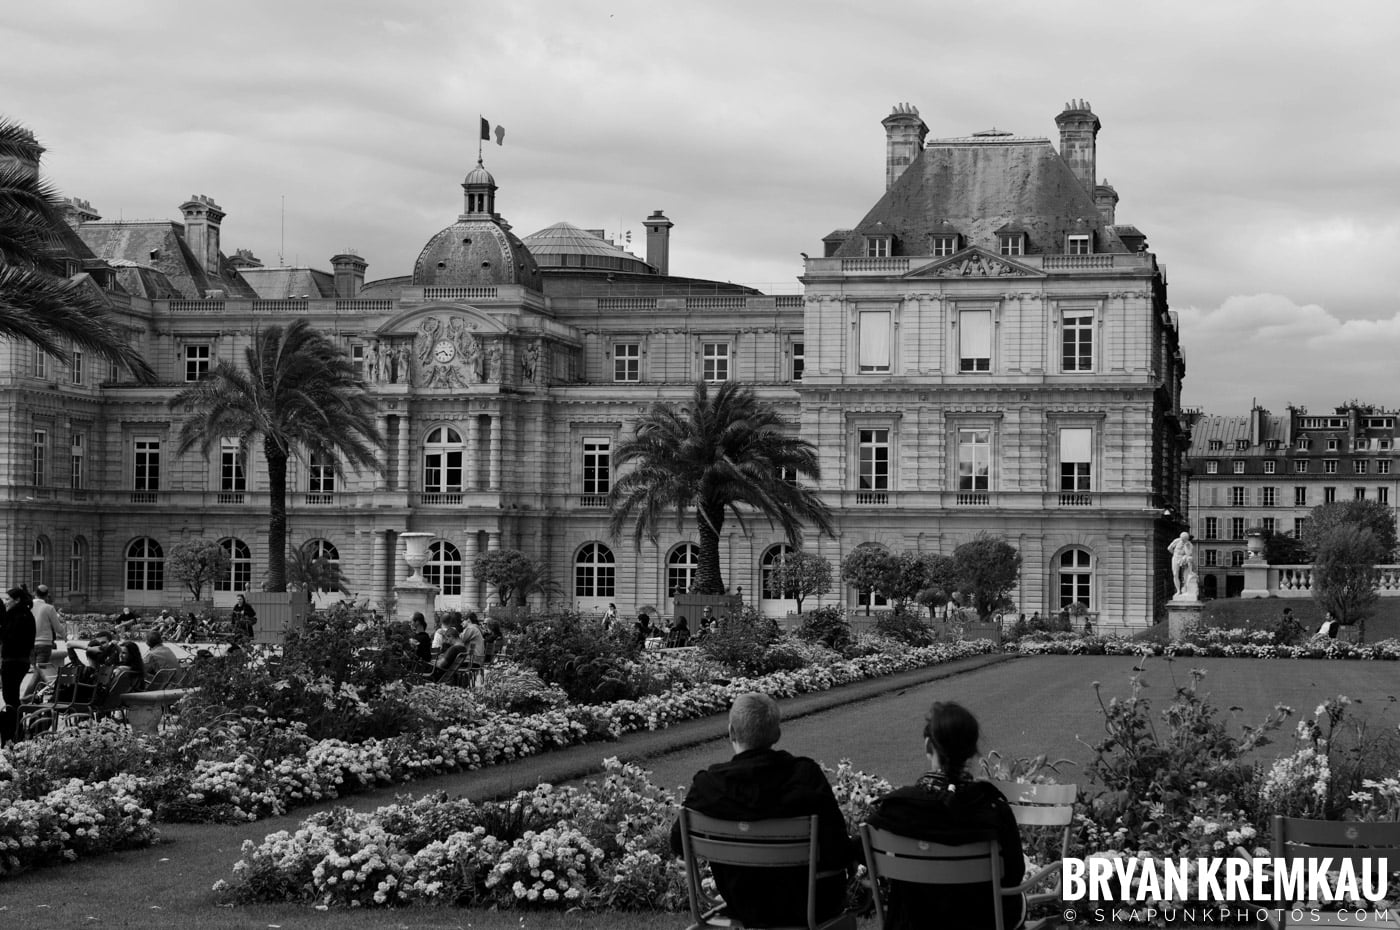 Paris, France Honeymoon - Day 1 - 7.18.11 (44)